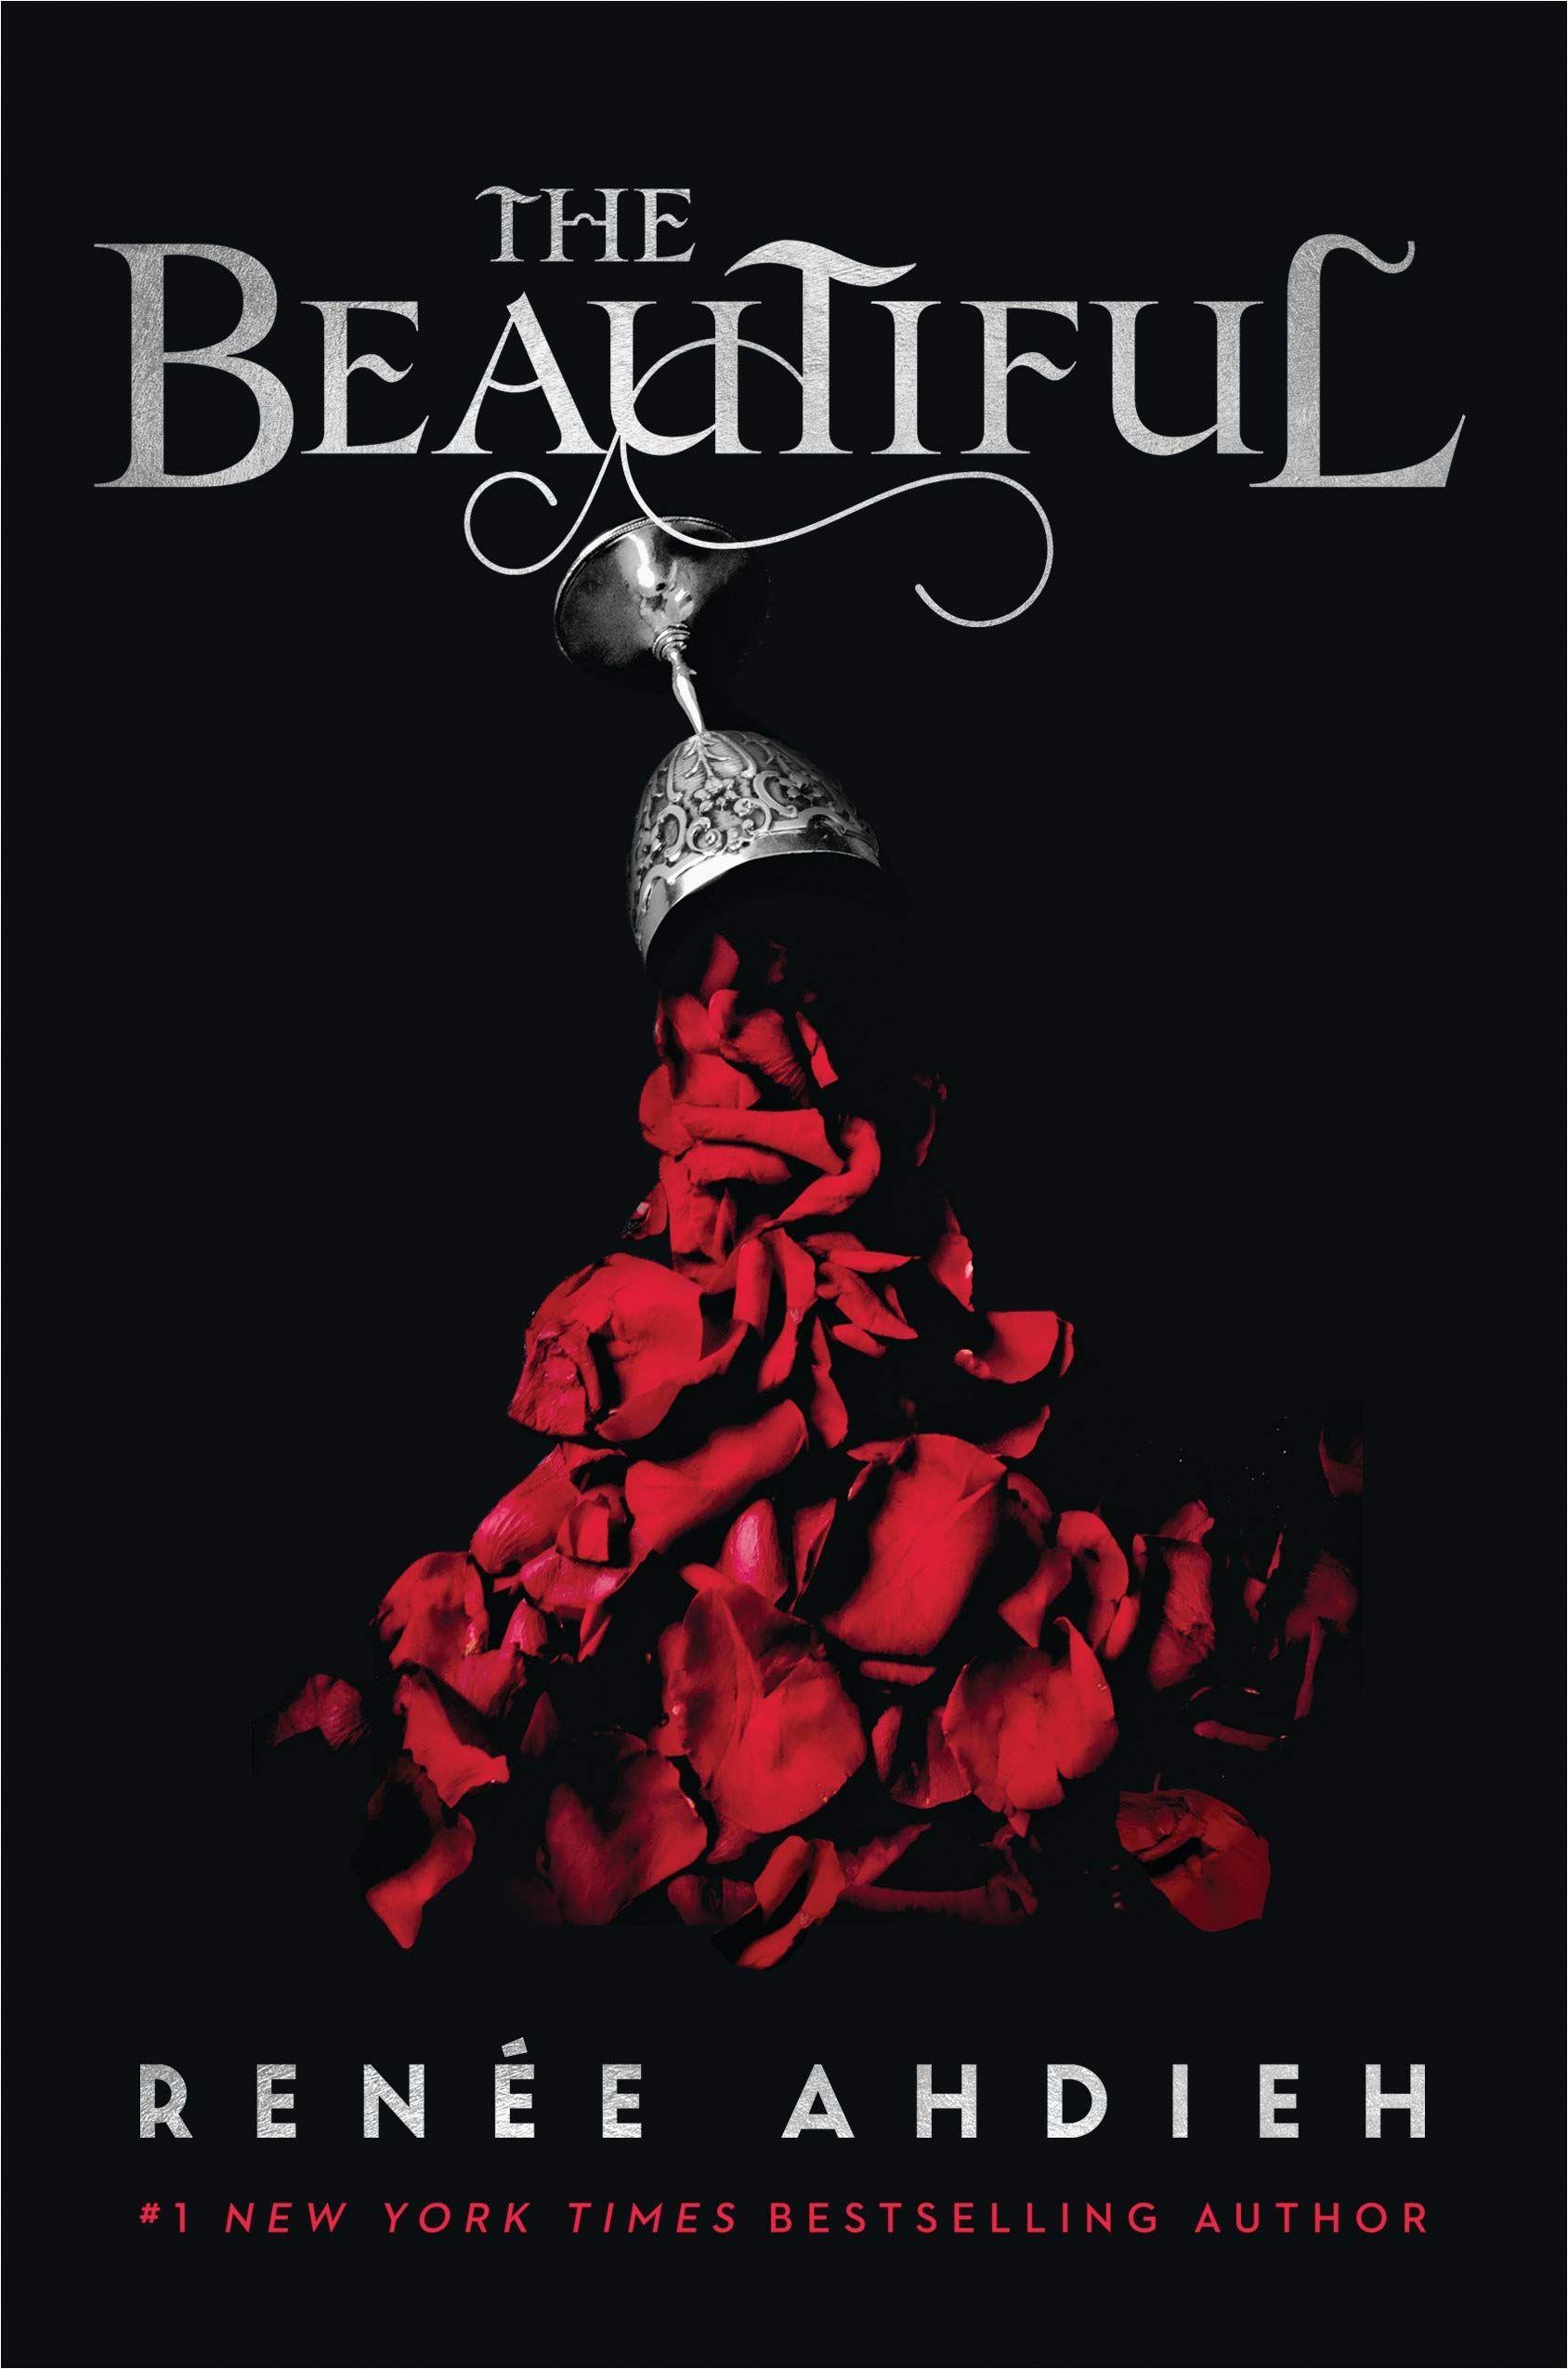 Ebook The Beautiful The Beautiful 1 By Renee Ahdieh Free